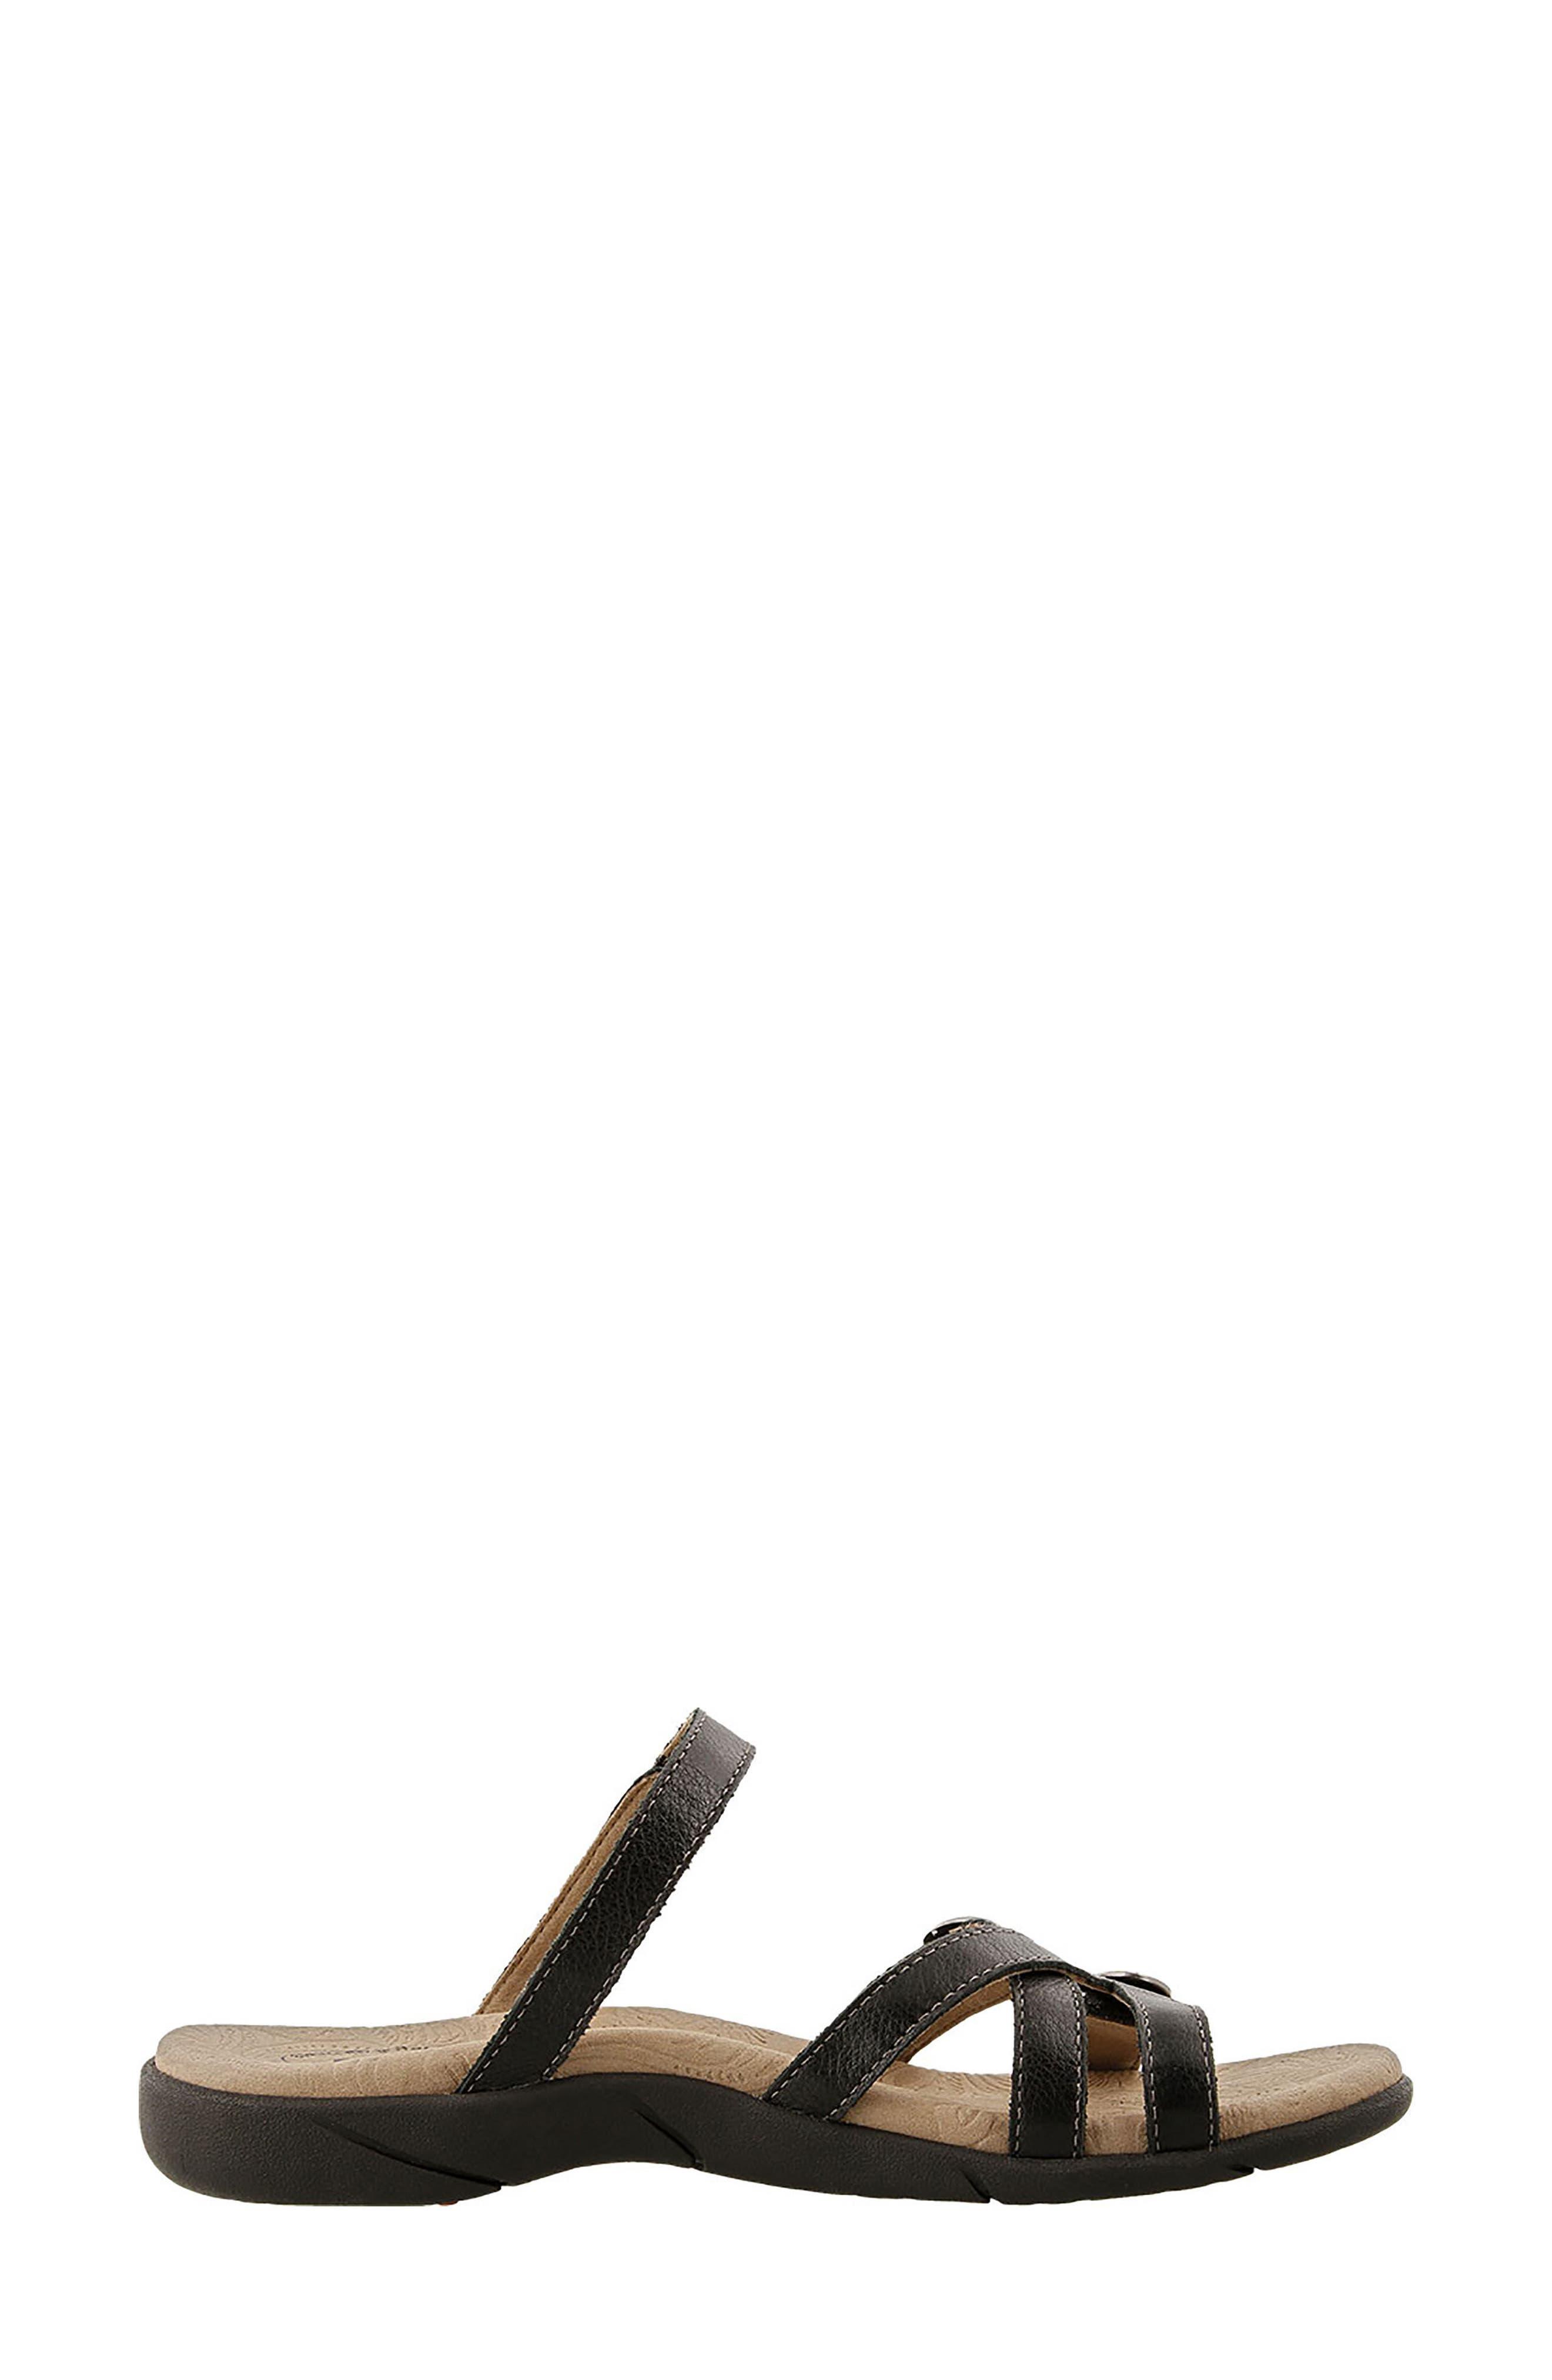 Captive Sandal,                             Alternate thumbnail 3, color,                             BLACK LEATHER